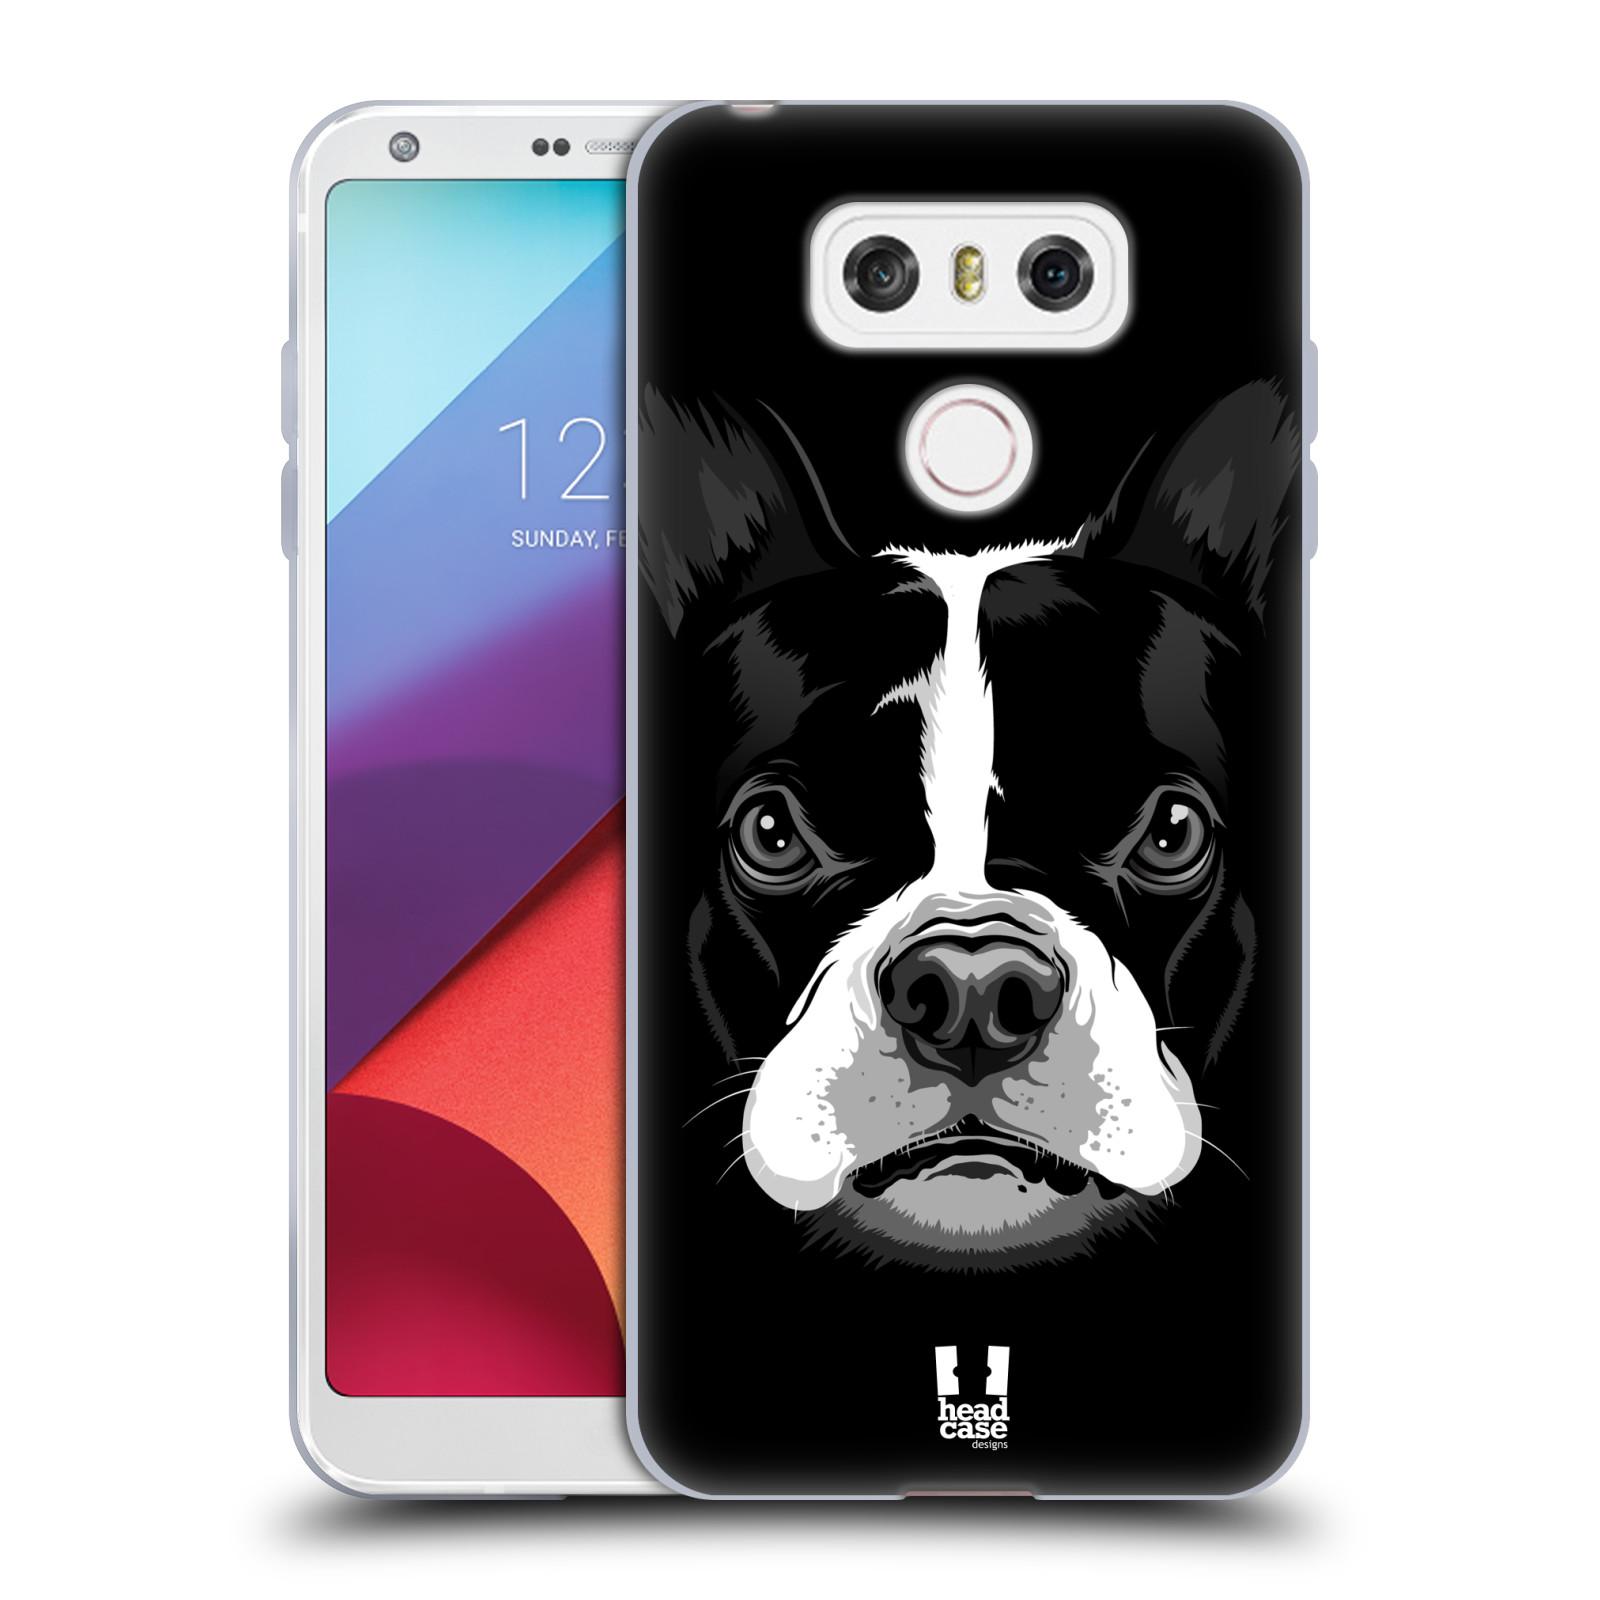 Silikonové pouzdro na mobil LG G6 - Head Case ILUSTROVANÝ BULDOČEK